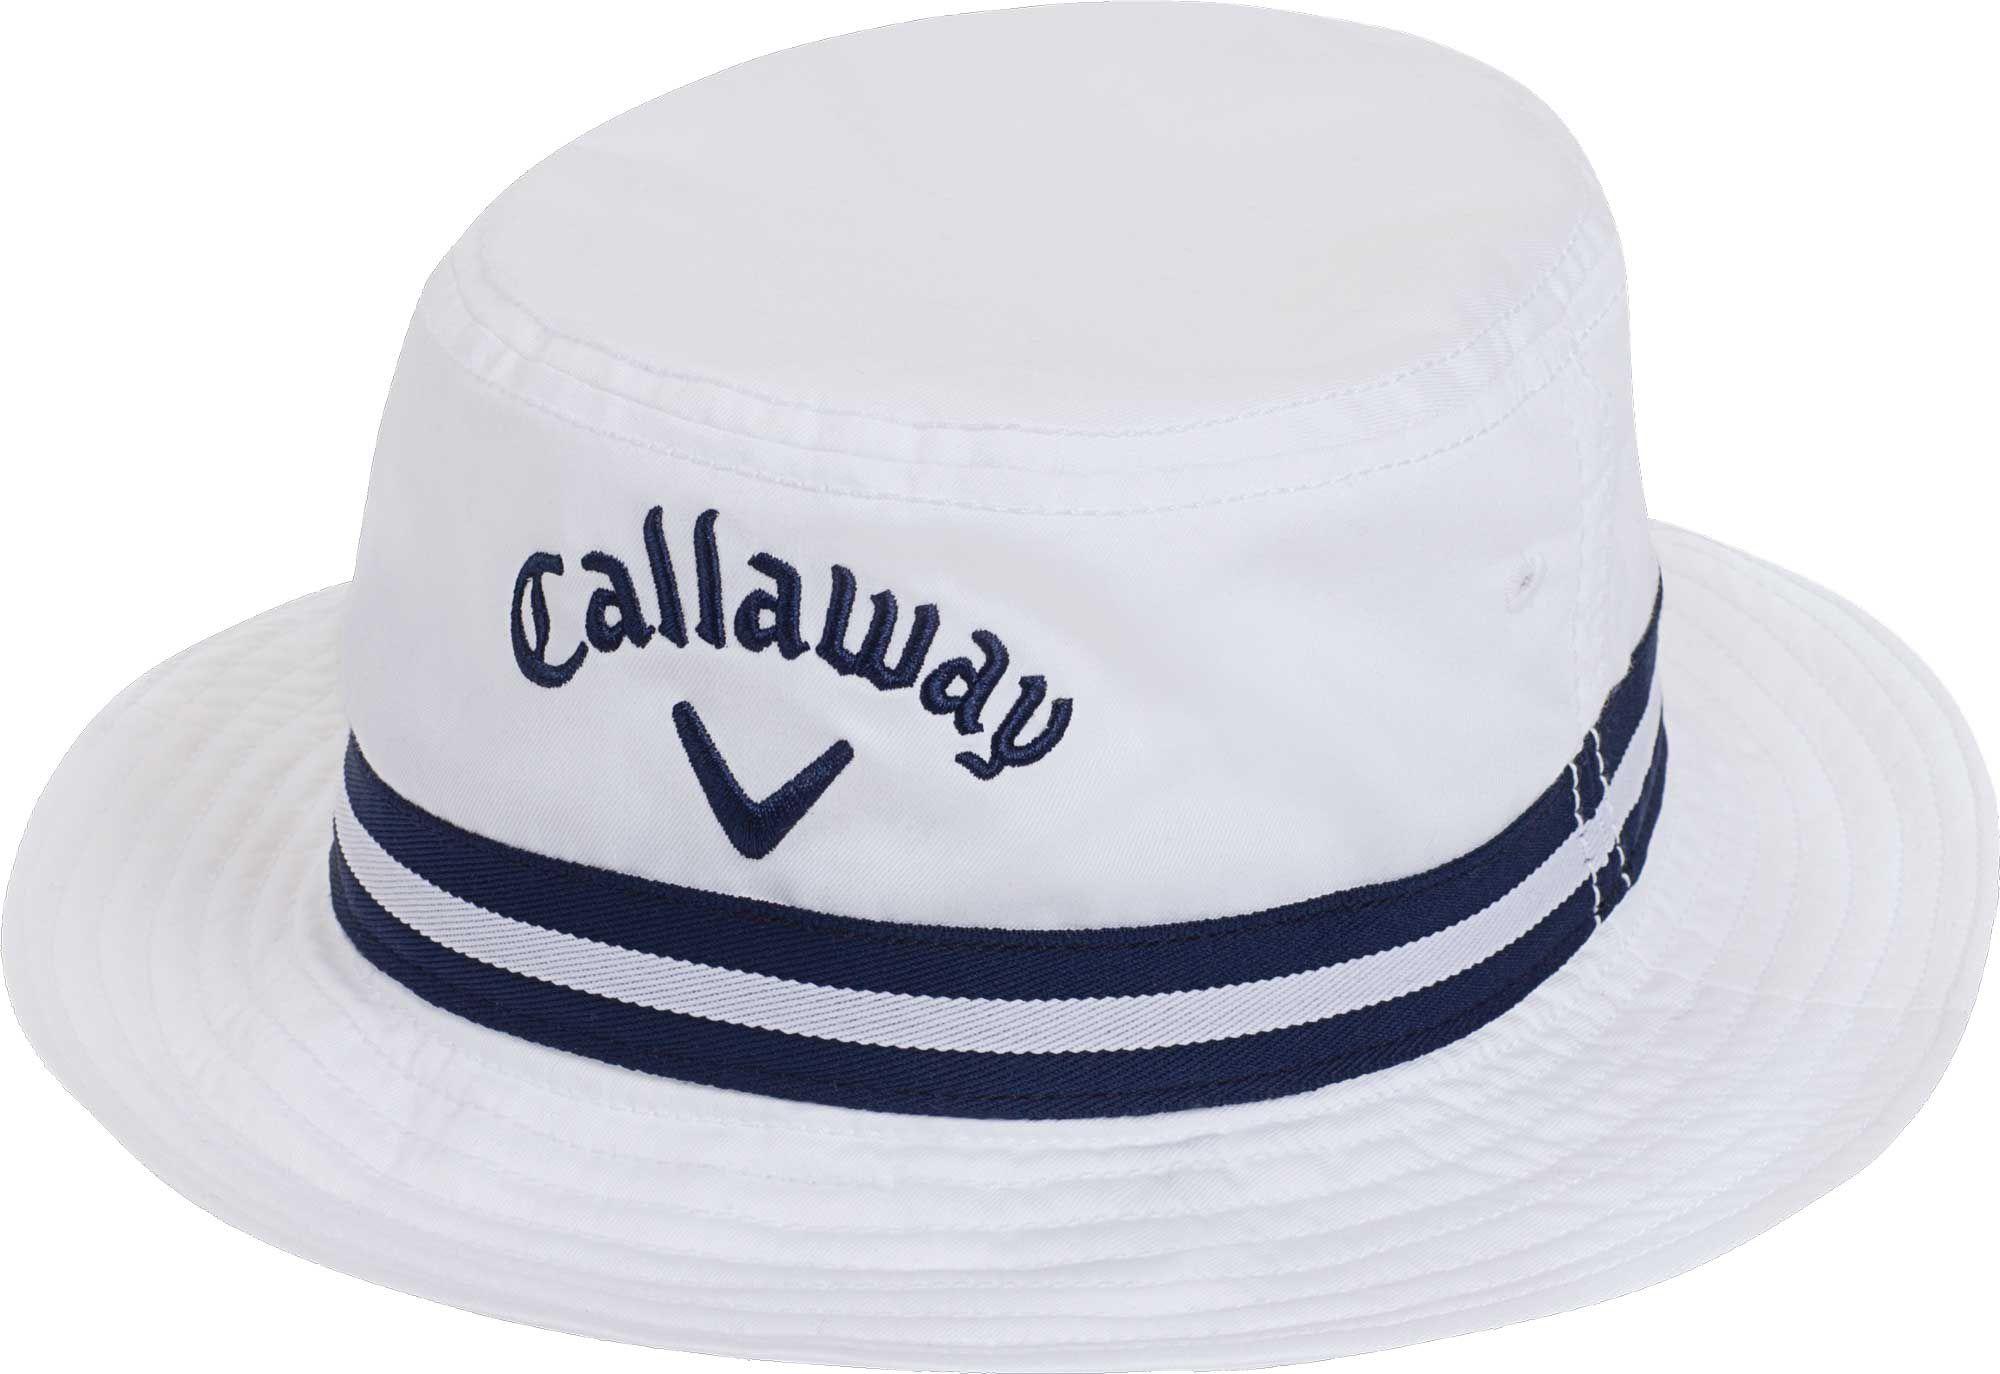 Callaway mens golf bucket hat dicks sporting goods noimagefound altavistaventures Images